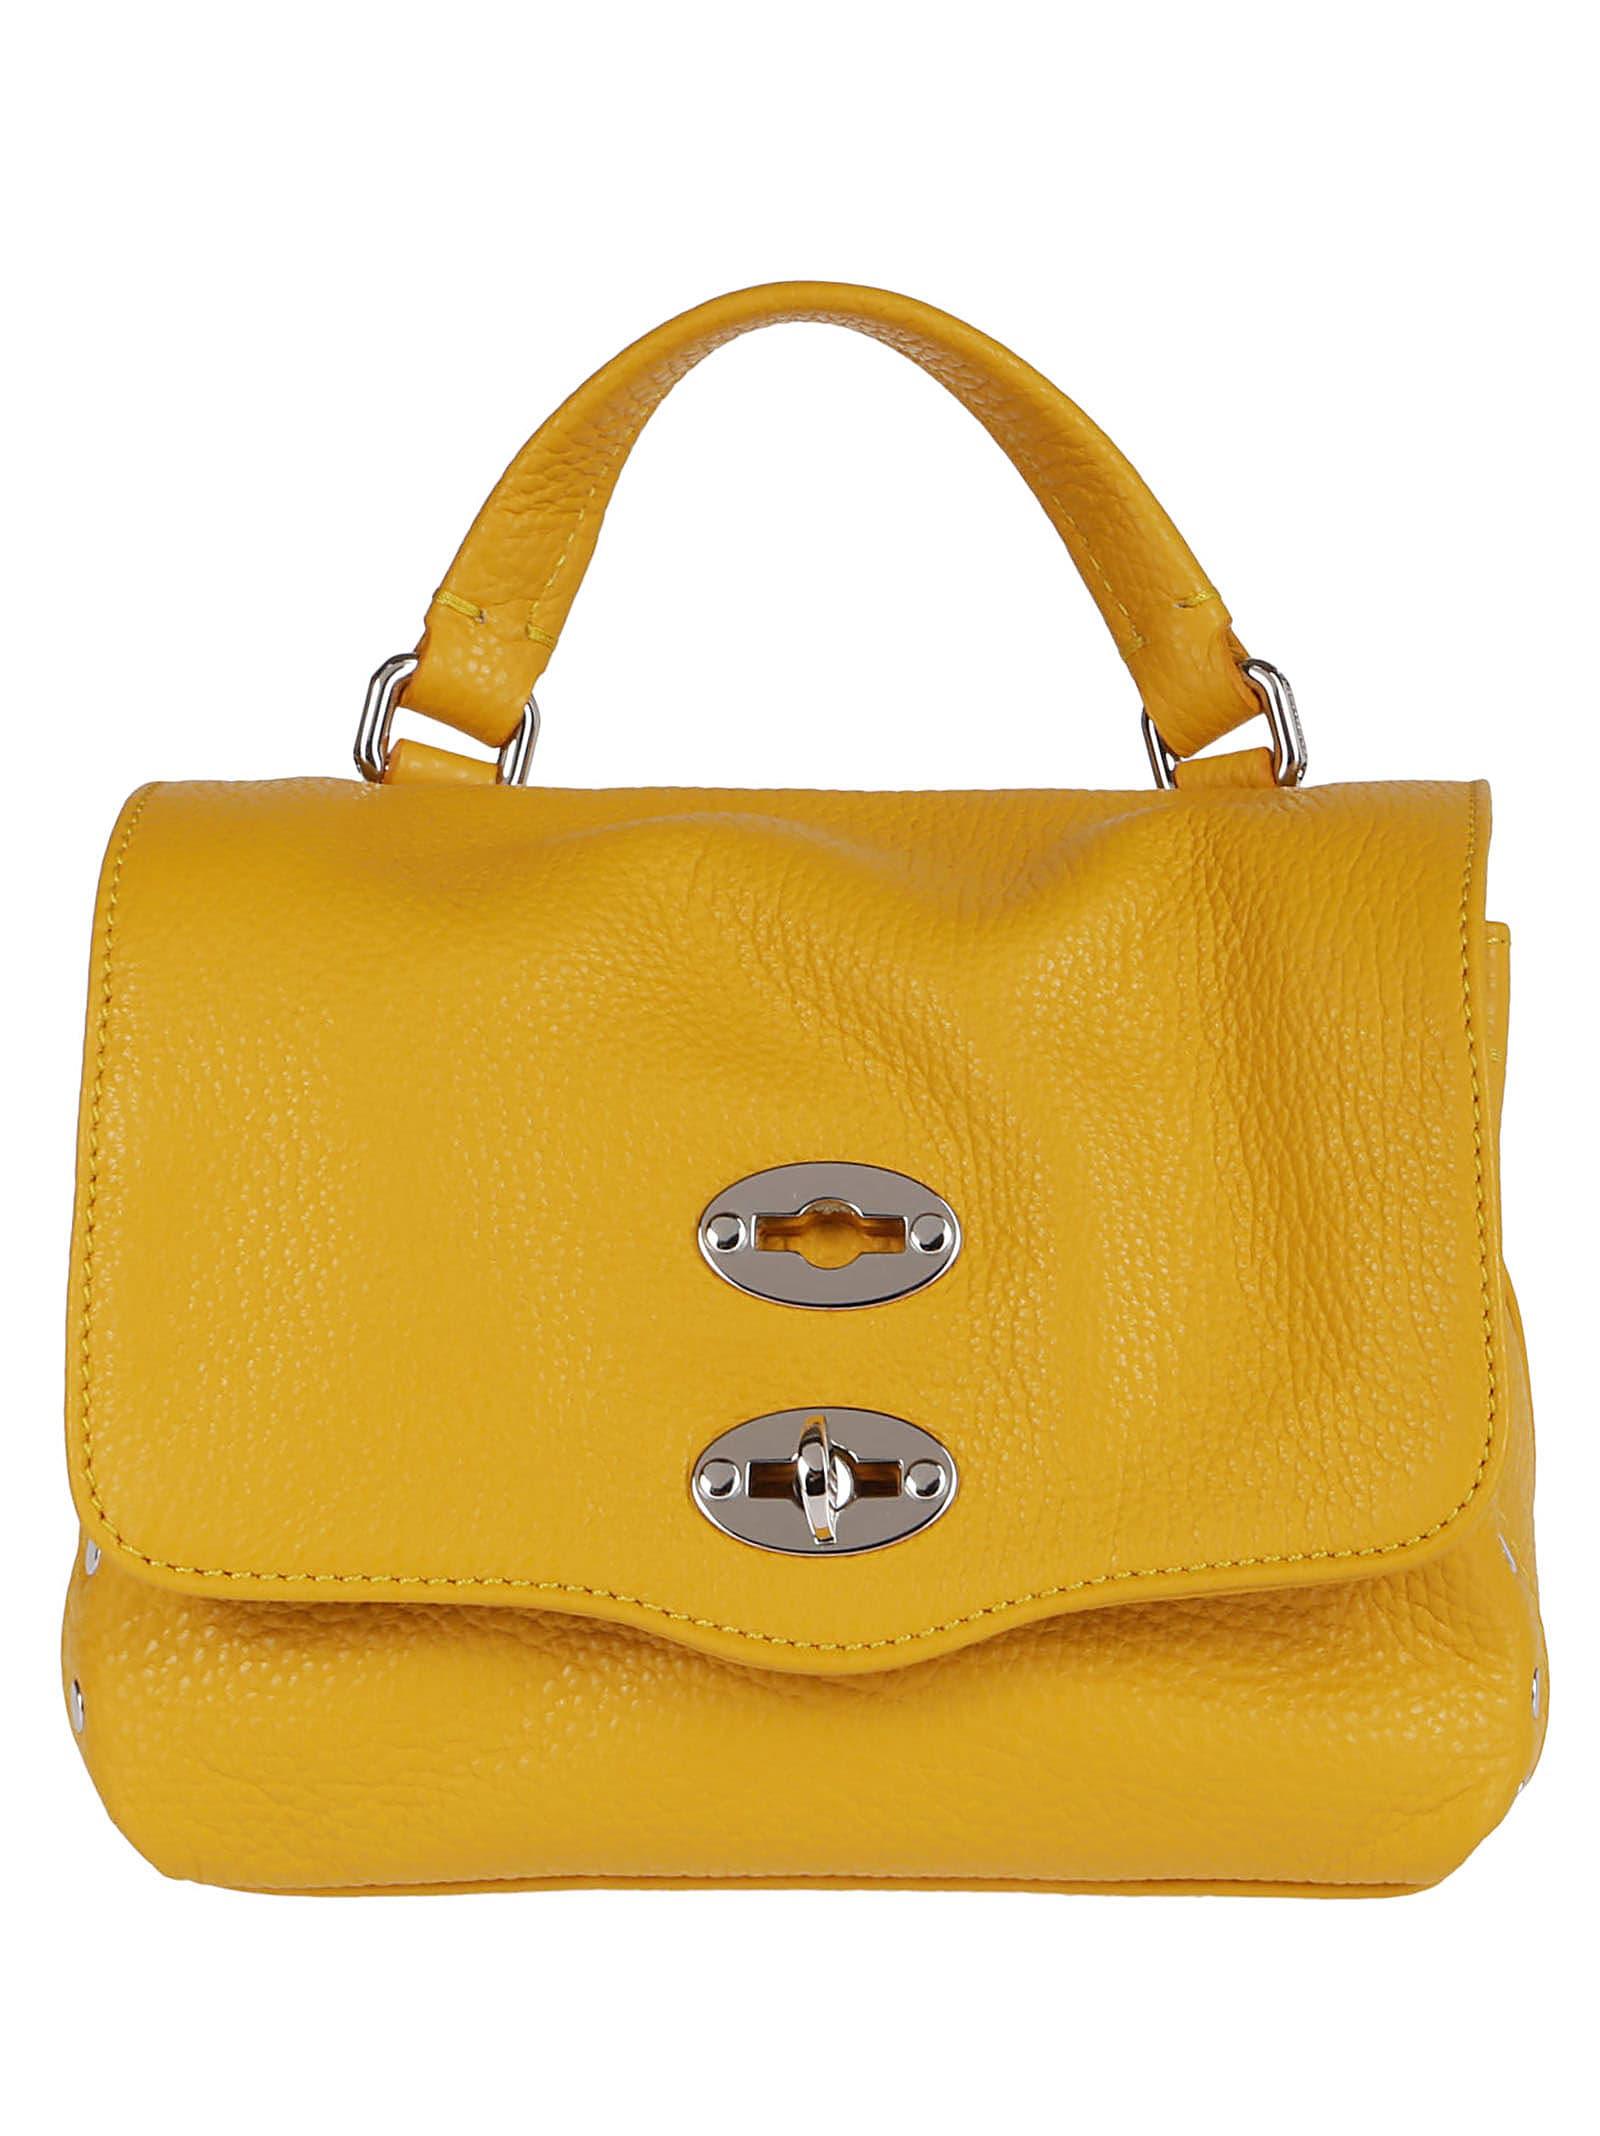 Zanellato Bags YELLOW LEATHER POSTINA BABY BAG